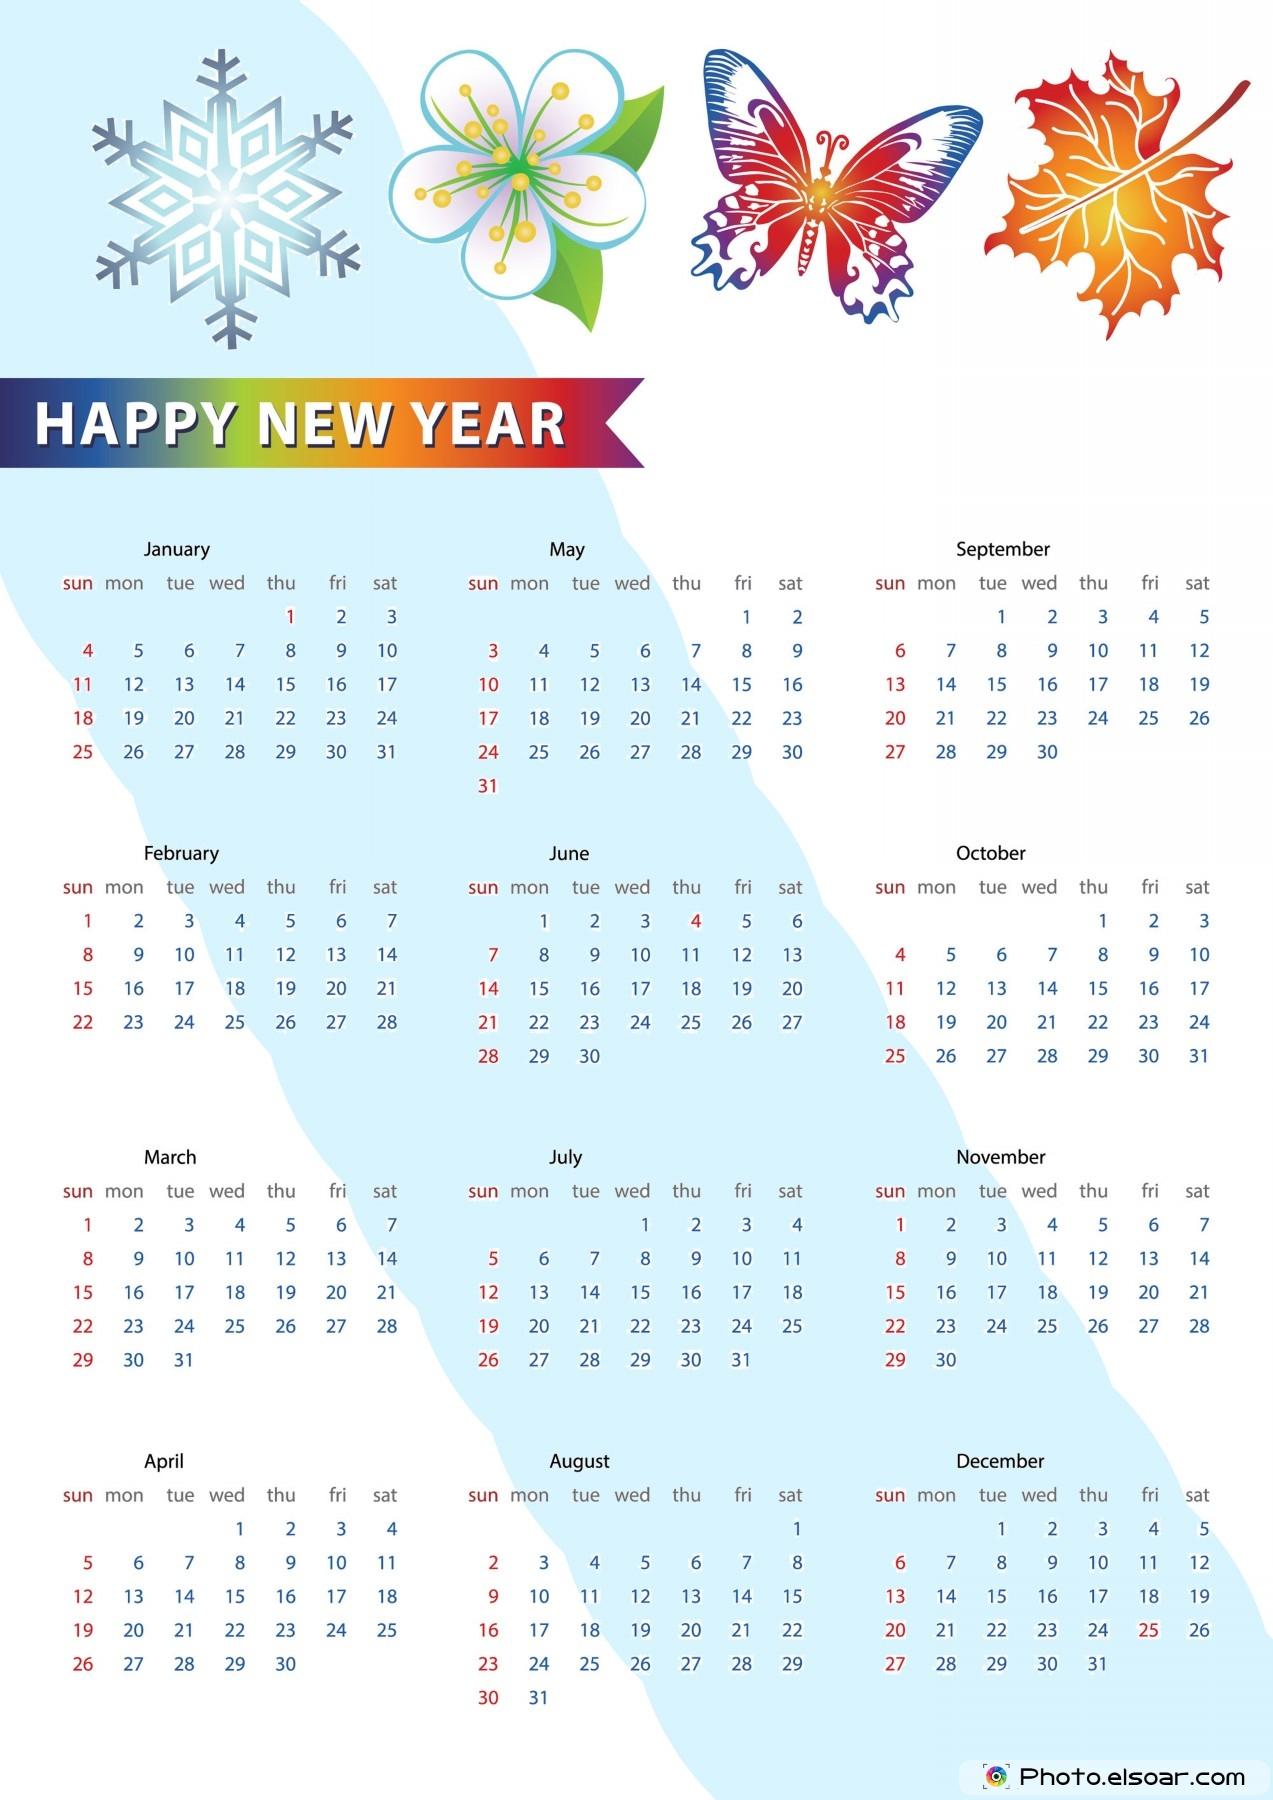 Happy New Year Calendar : Get printable calendars free download elsoar